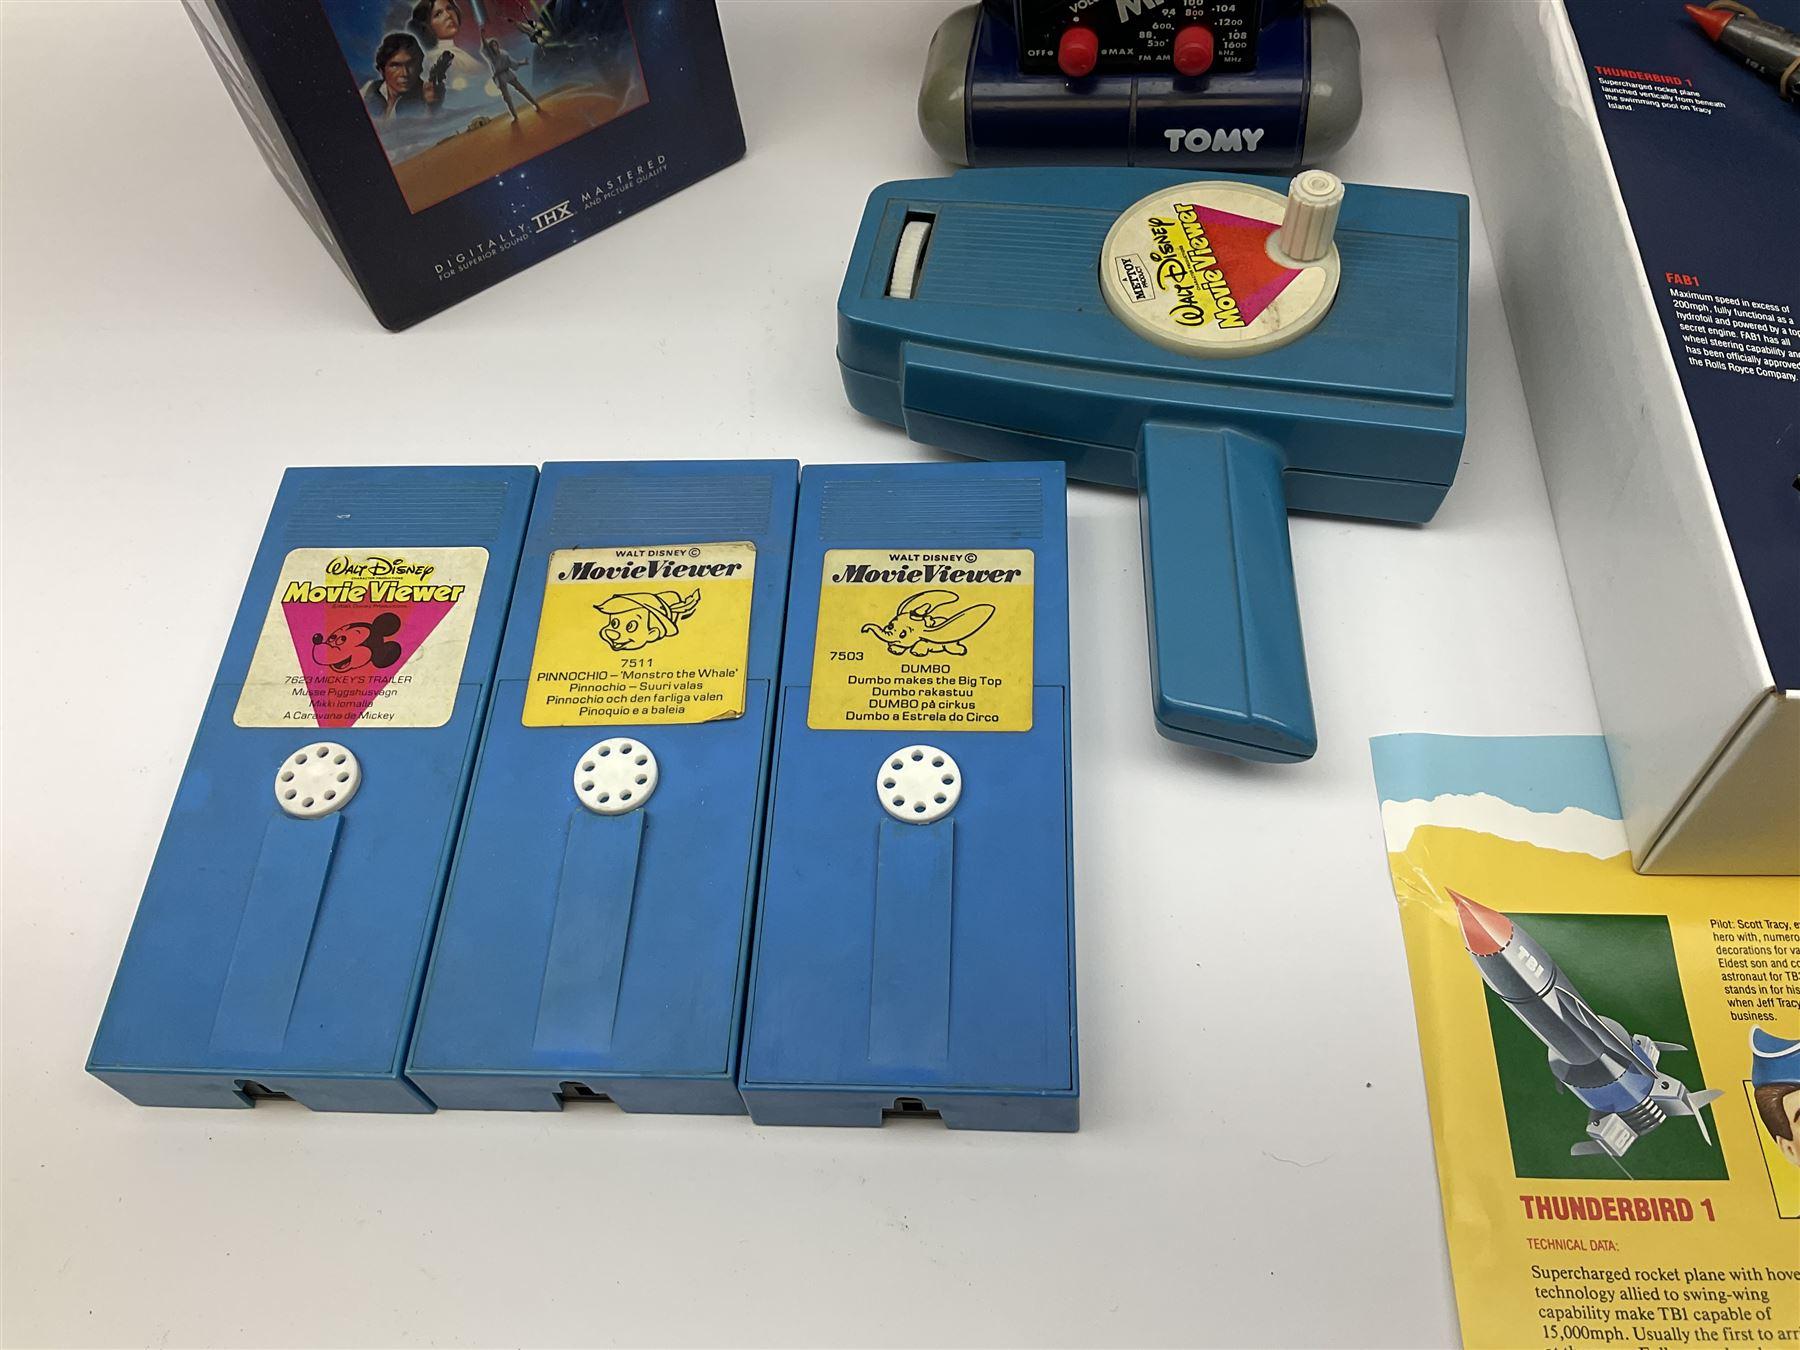 Matchbox 'The Thunderbirds' limited edition Commemorative Set - Image 2 of 7